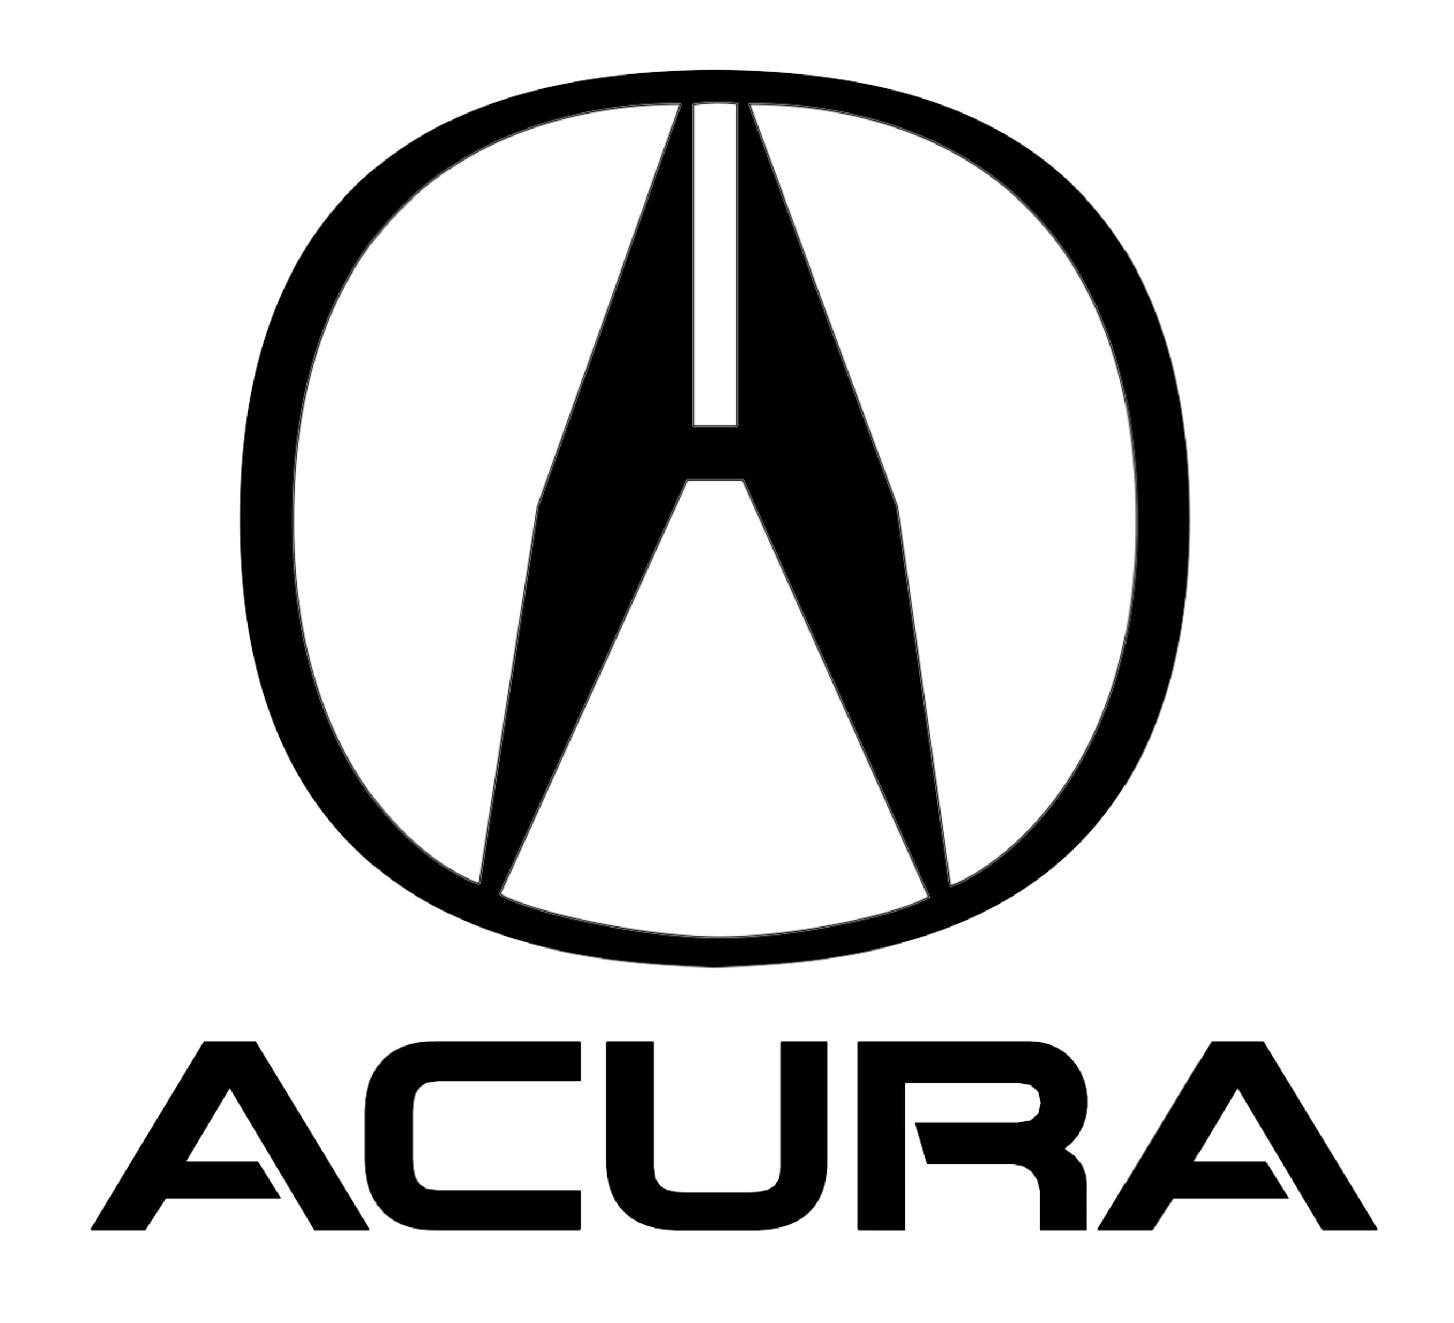 https://www.5starcar.com/acura-service-and-repair.html